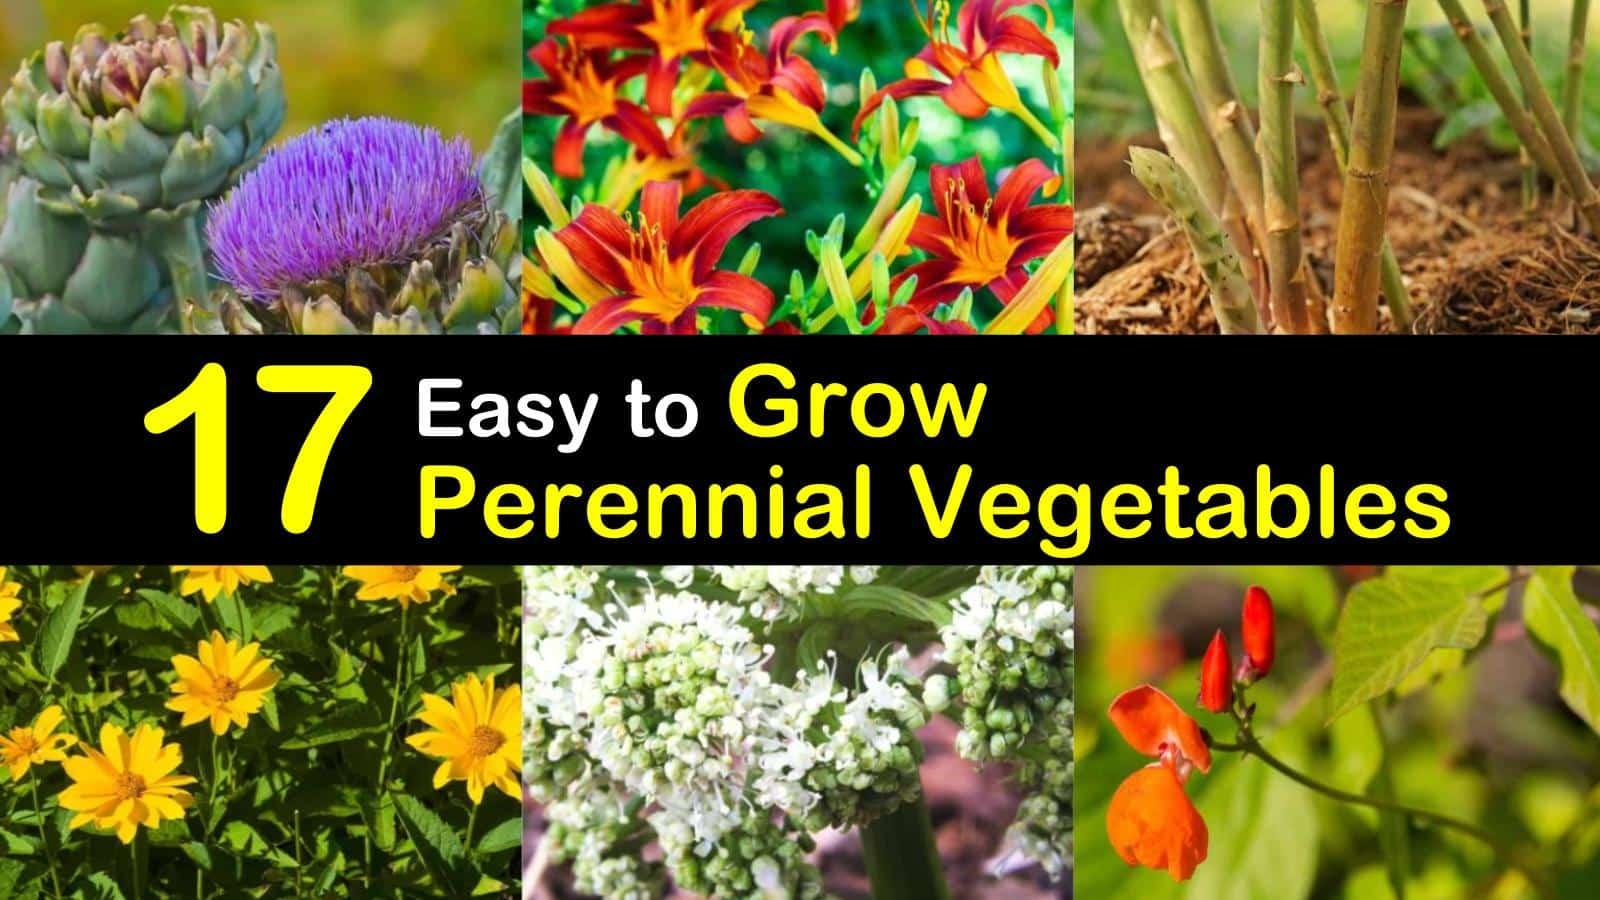 perennial vegetables titleimg1